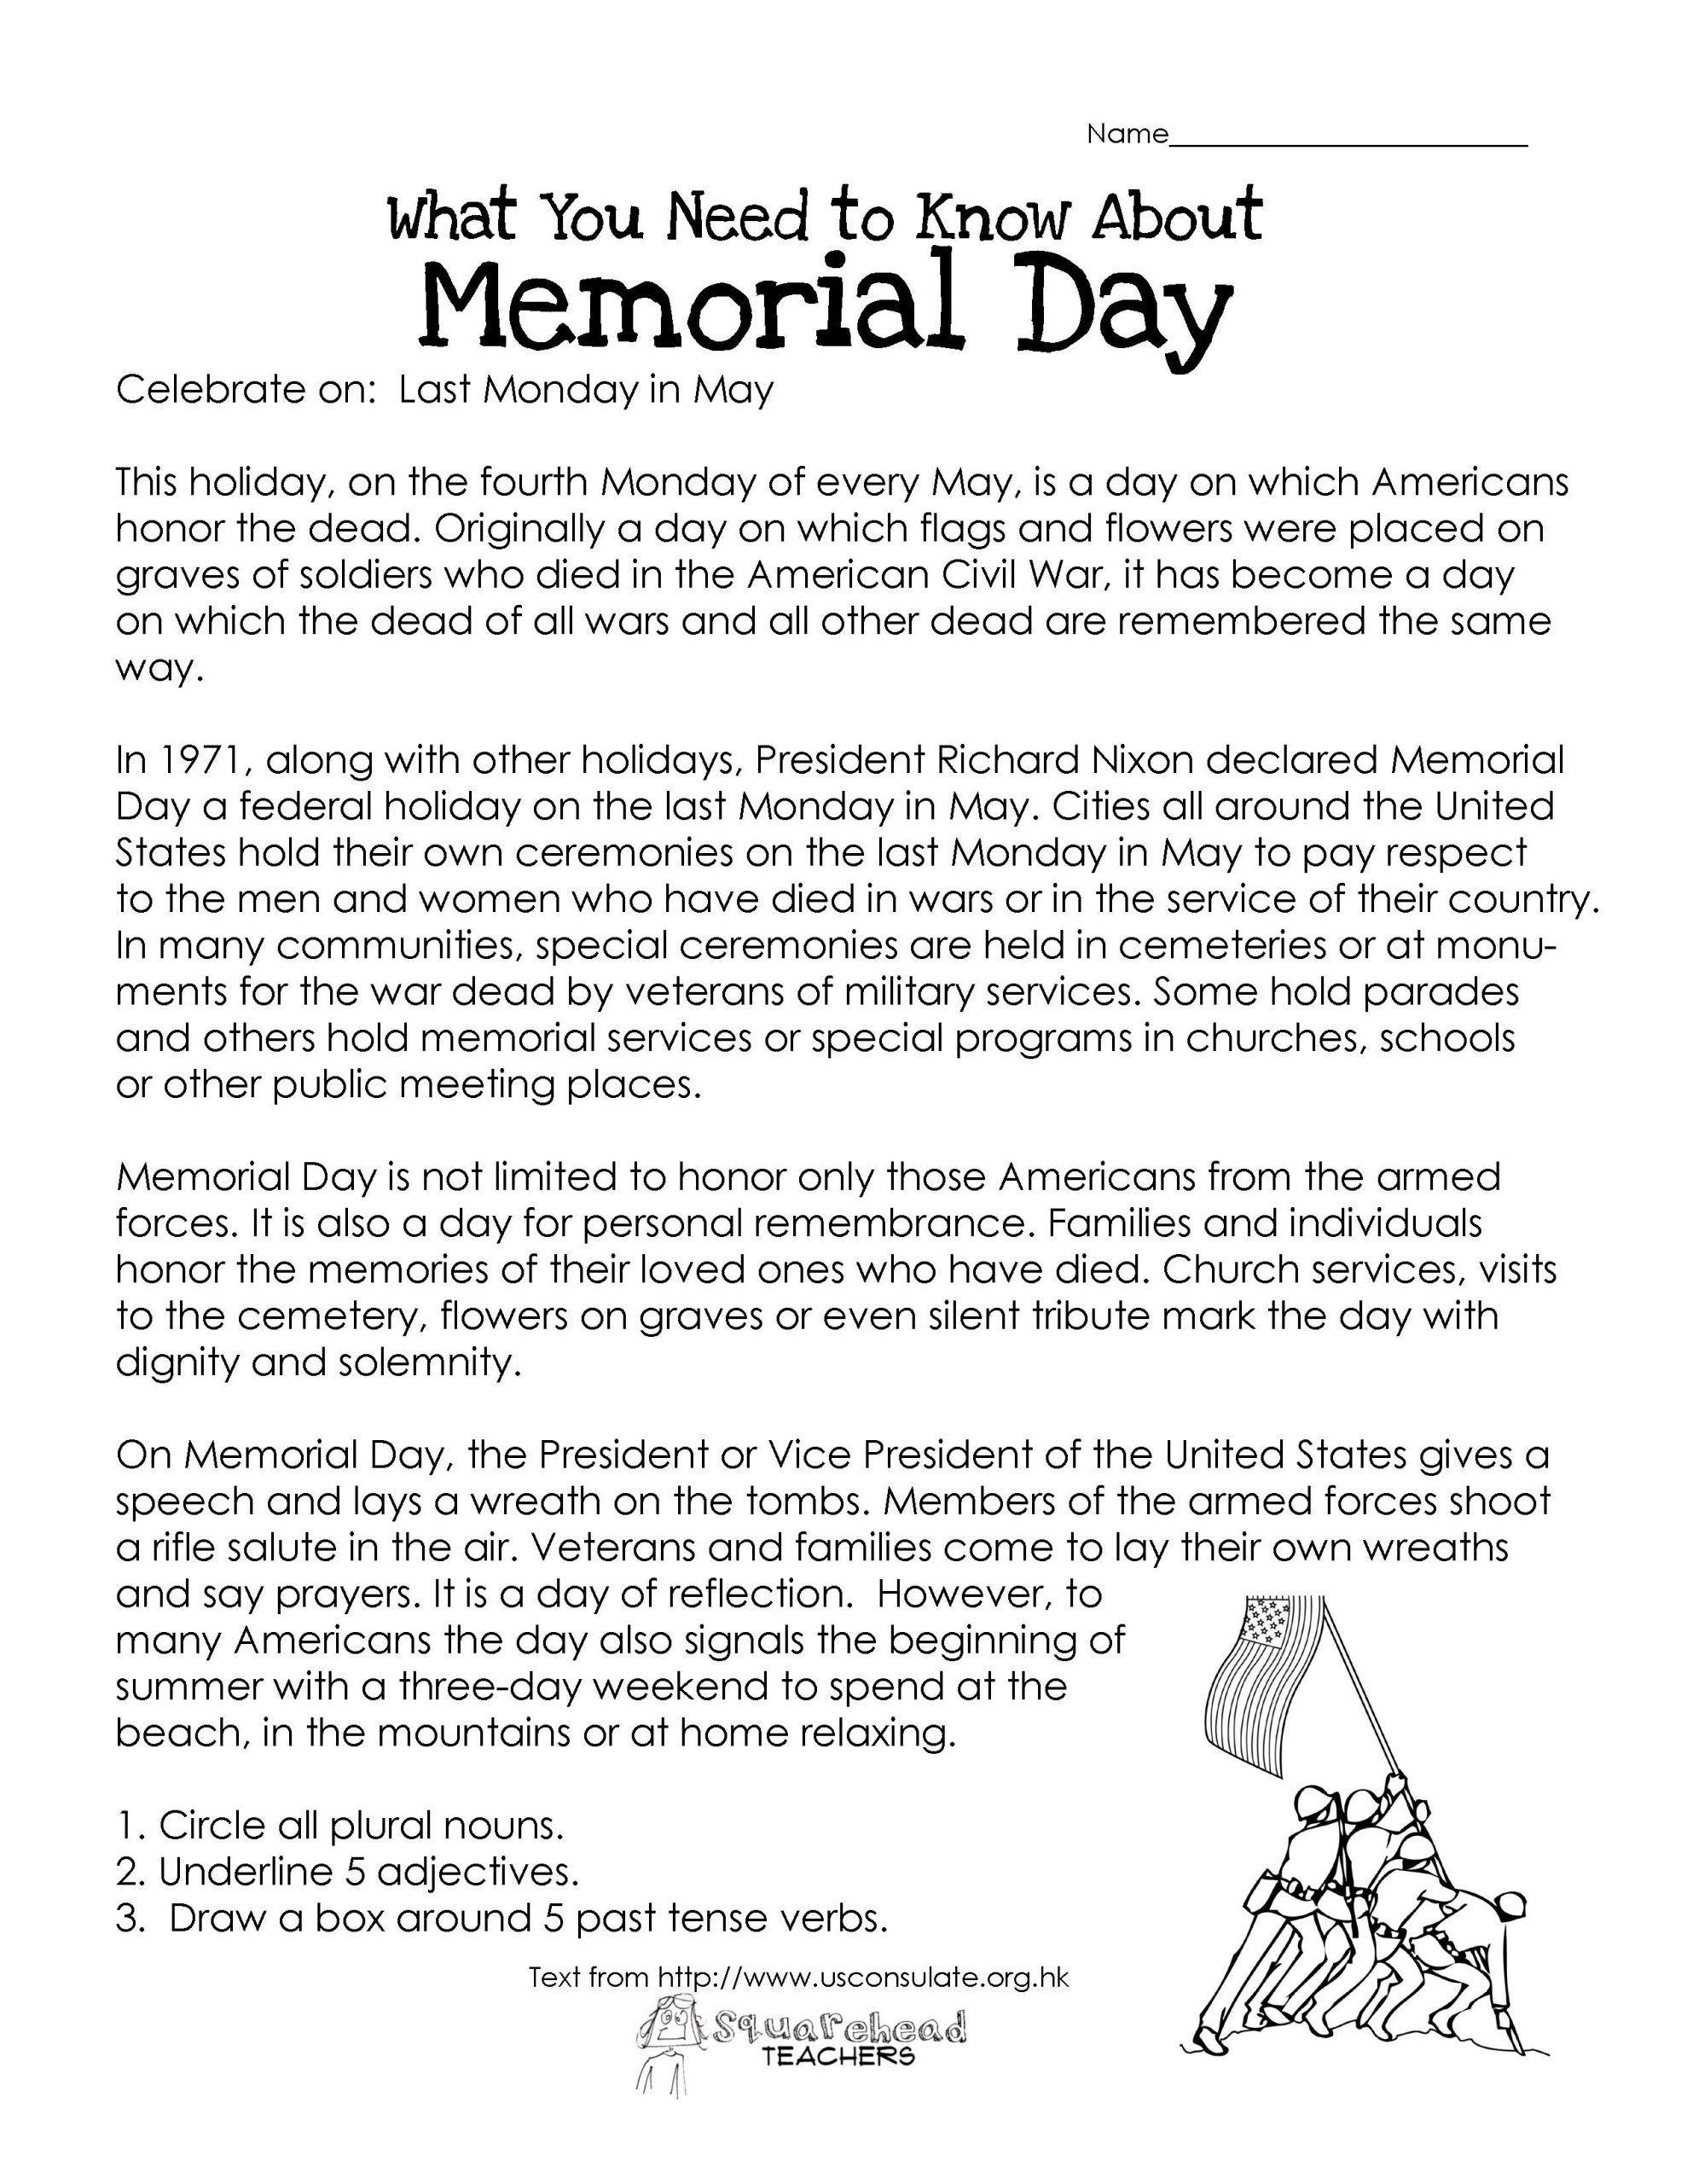 Memorial Day Worksheets For Kindergarten Memorial Day Free